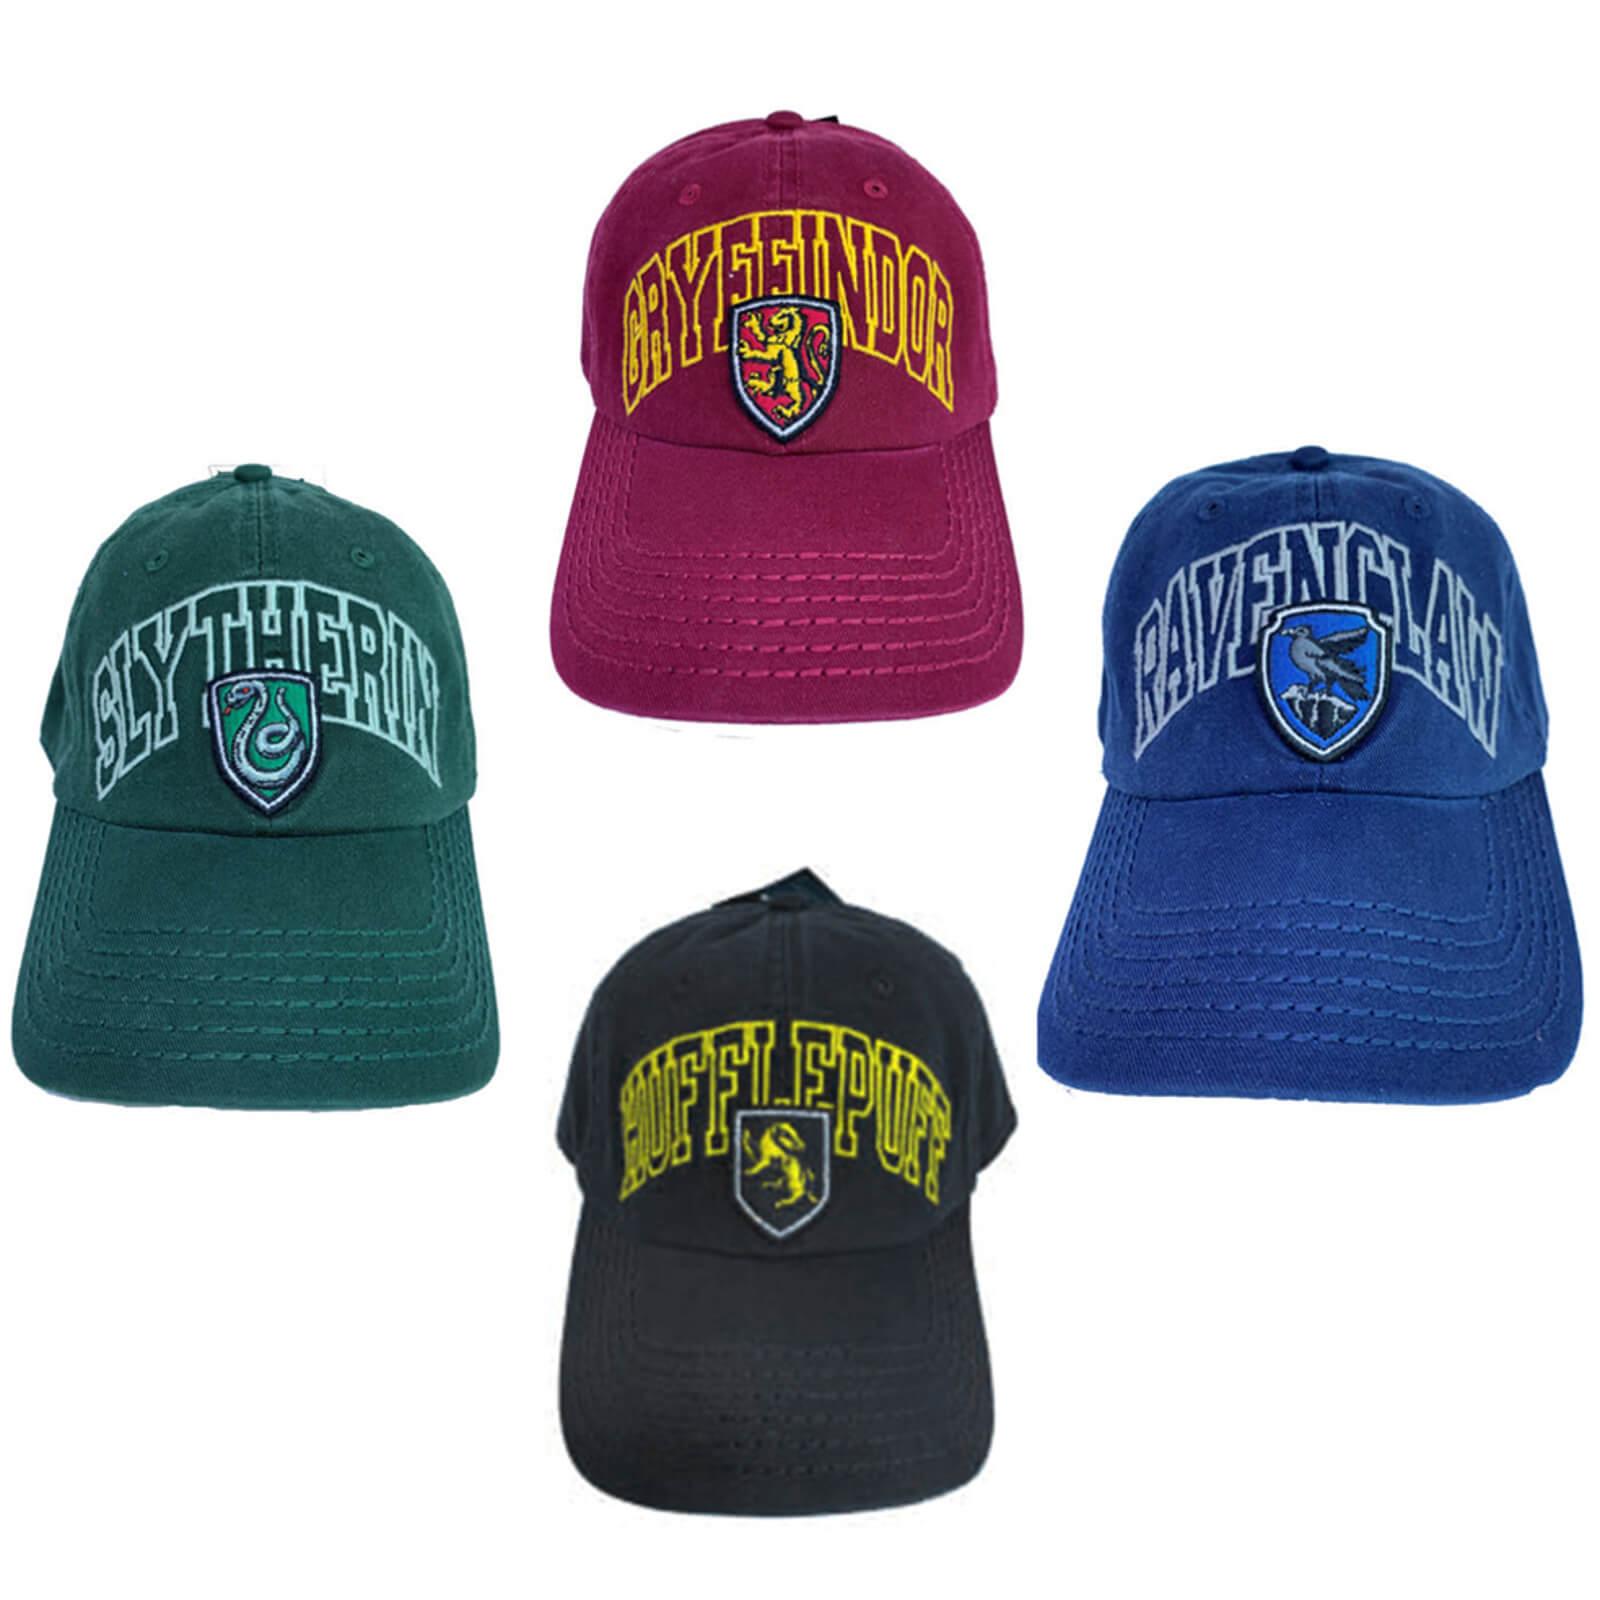 Harry Potter 4er Pack Caps für 11,26€ @ Zavvi